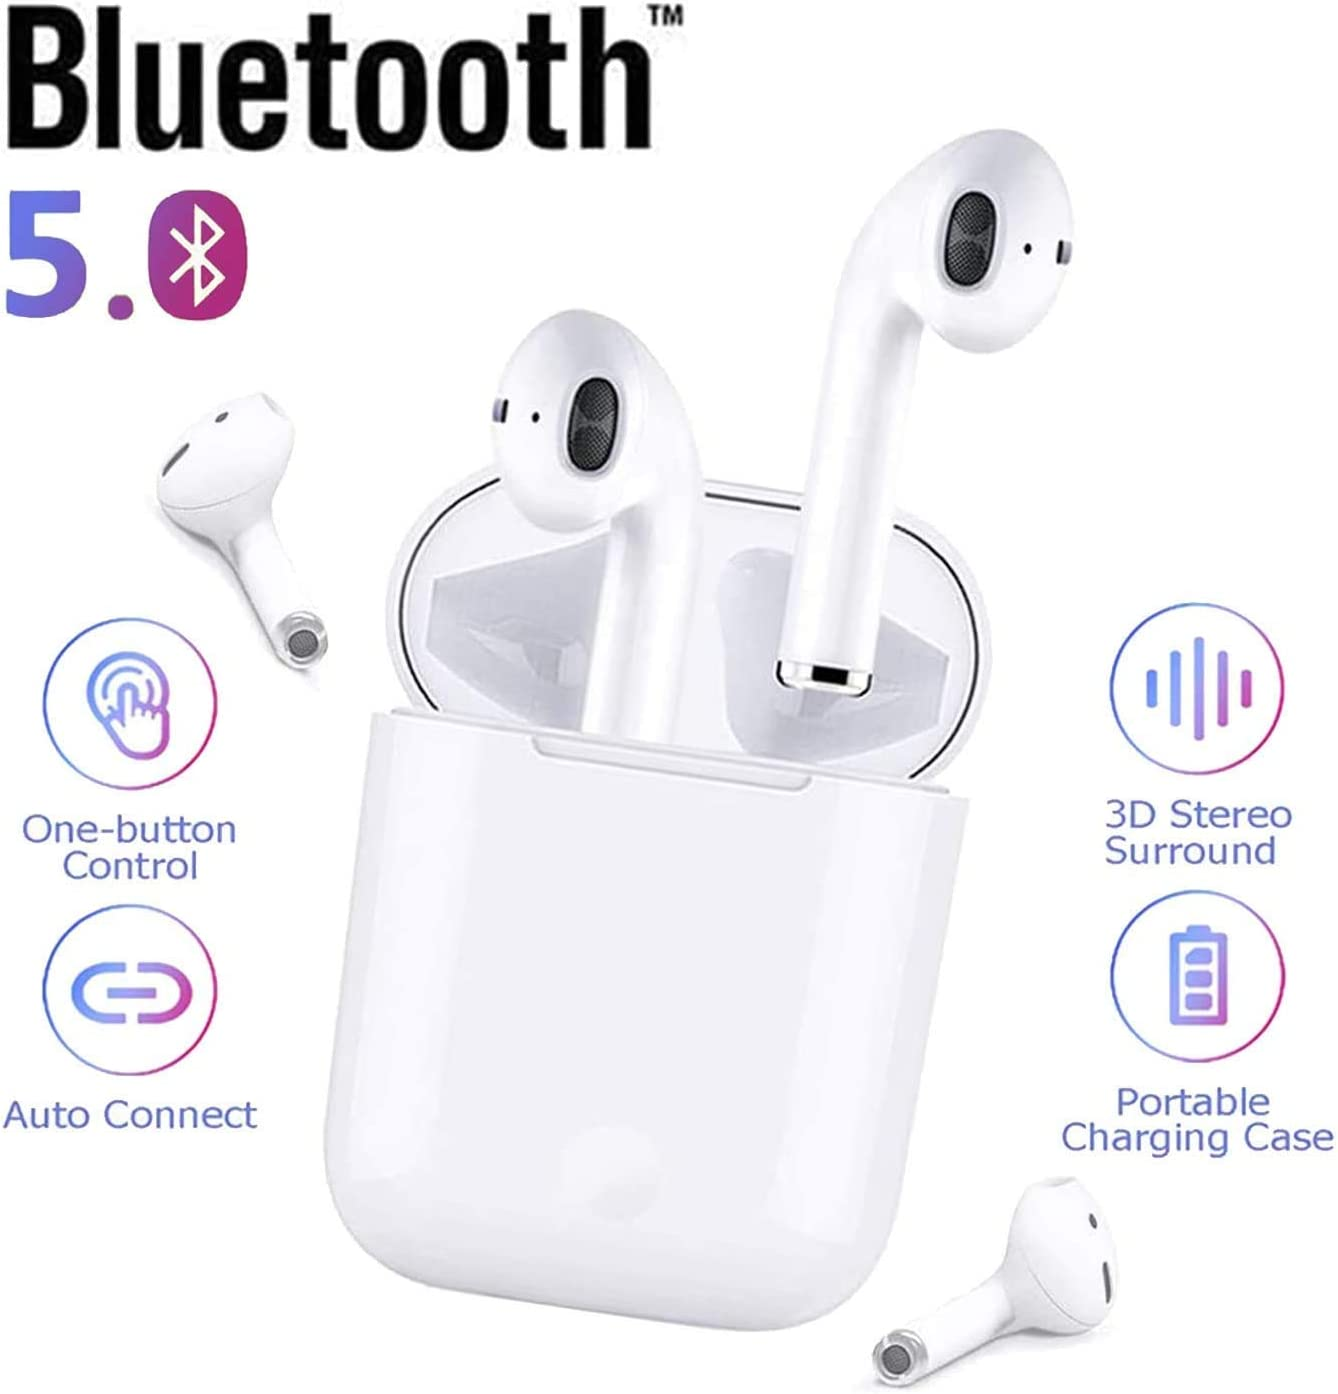 Auriculares Bluetooth 5.0 Auriculares Inalambricos Cascos Bluetooth Headphone Deportivos con Mic y Cancelación de Ruido Caja de Carga - Auriculares Compatible con iPhone Airpods/Samsung/Huawei